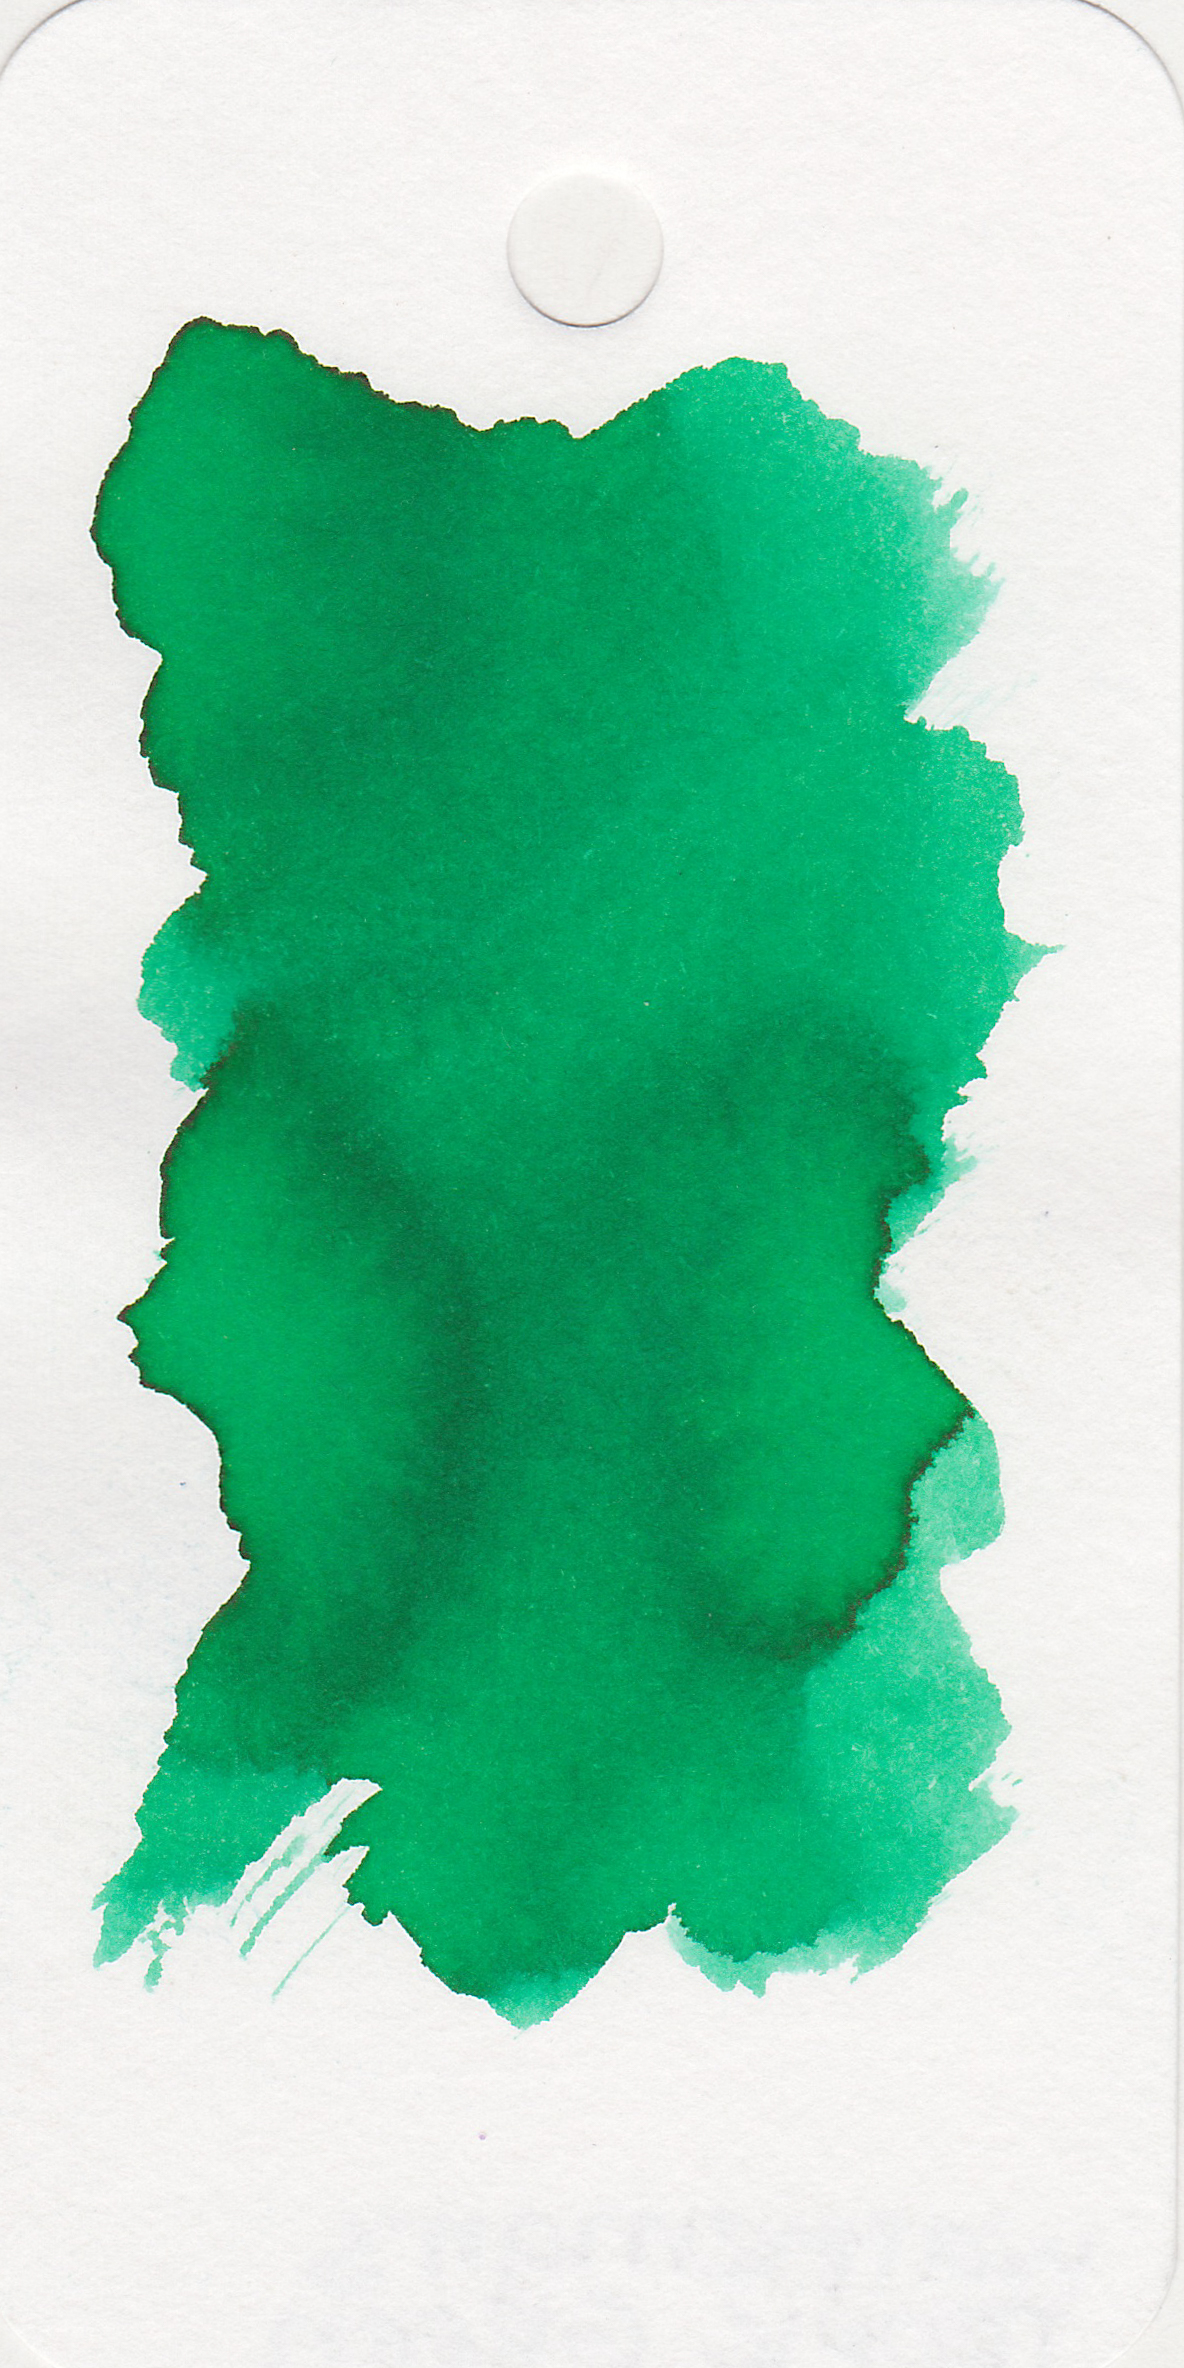 skr-emerald-green-3.jpg